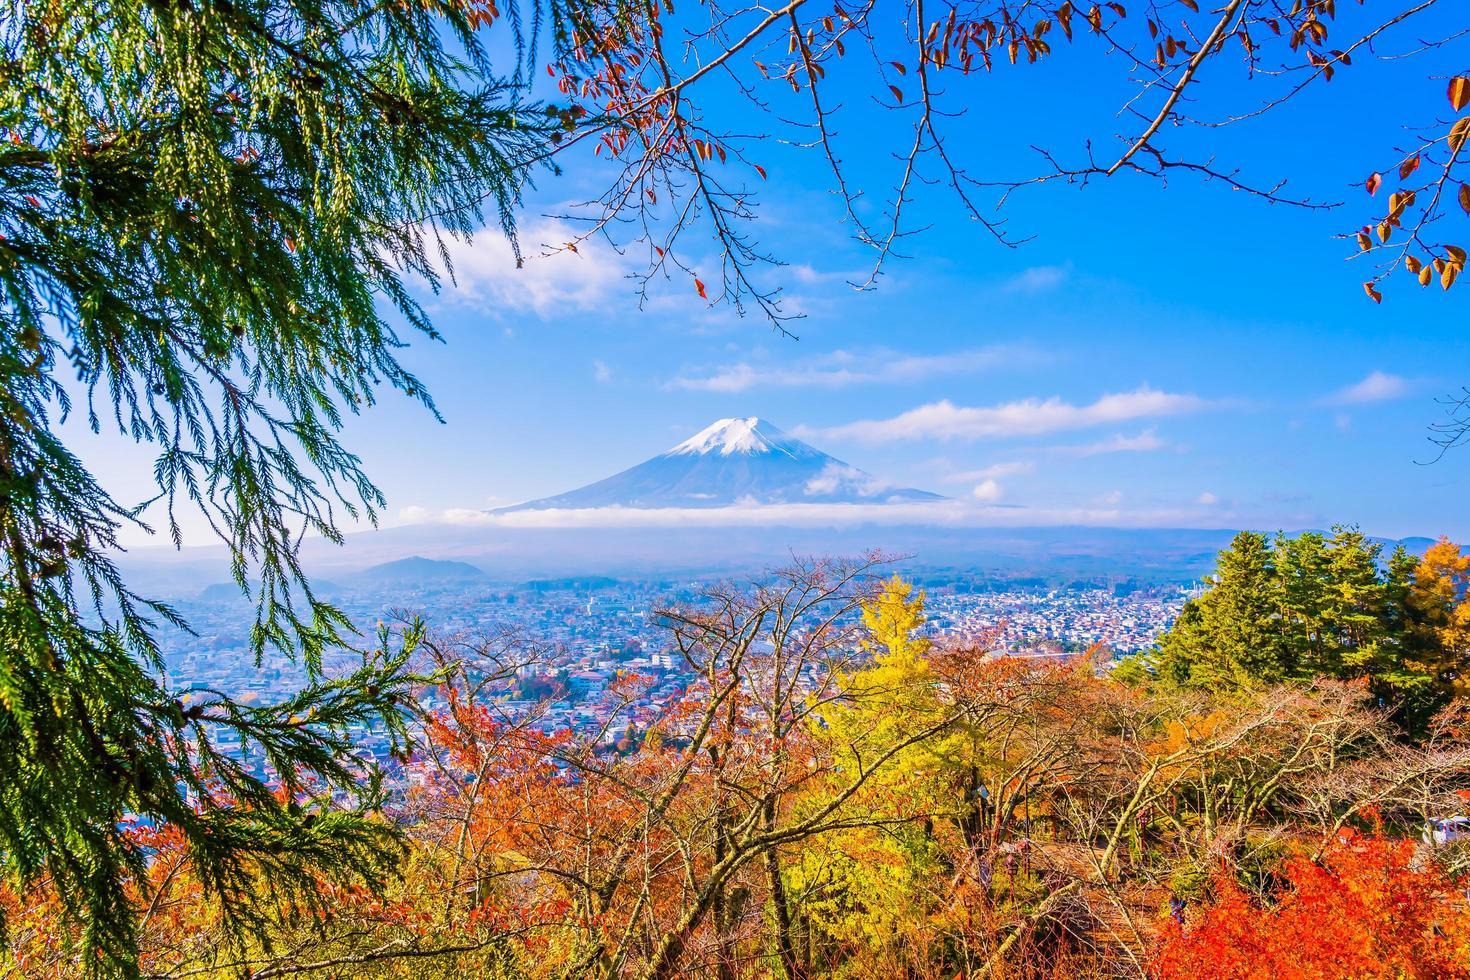 Mt. Fuji in Japan in autumn photo